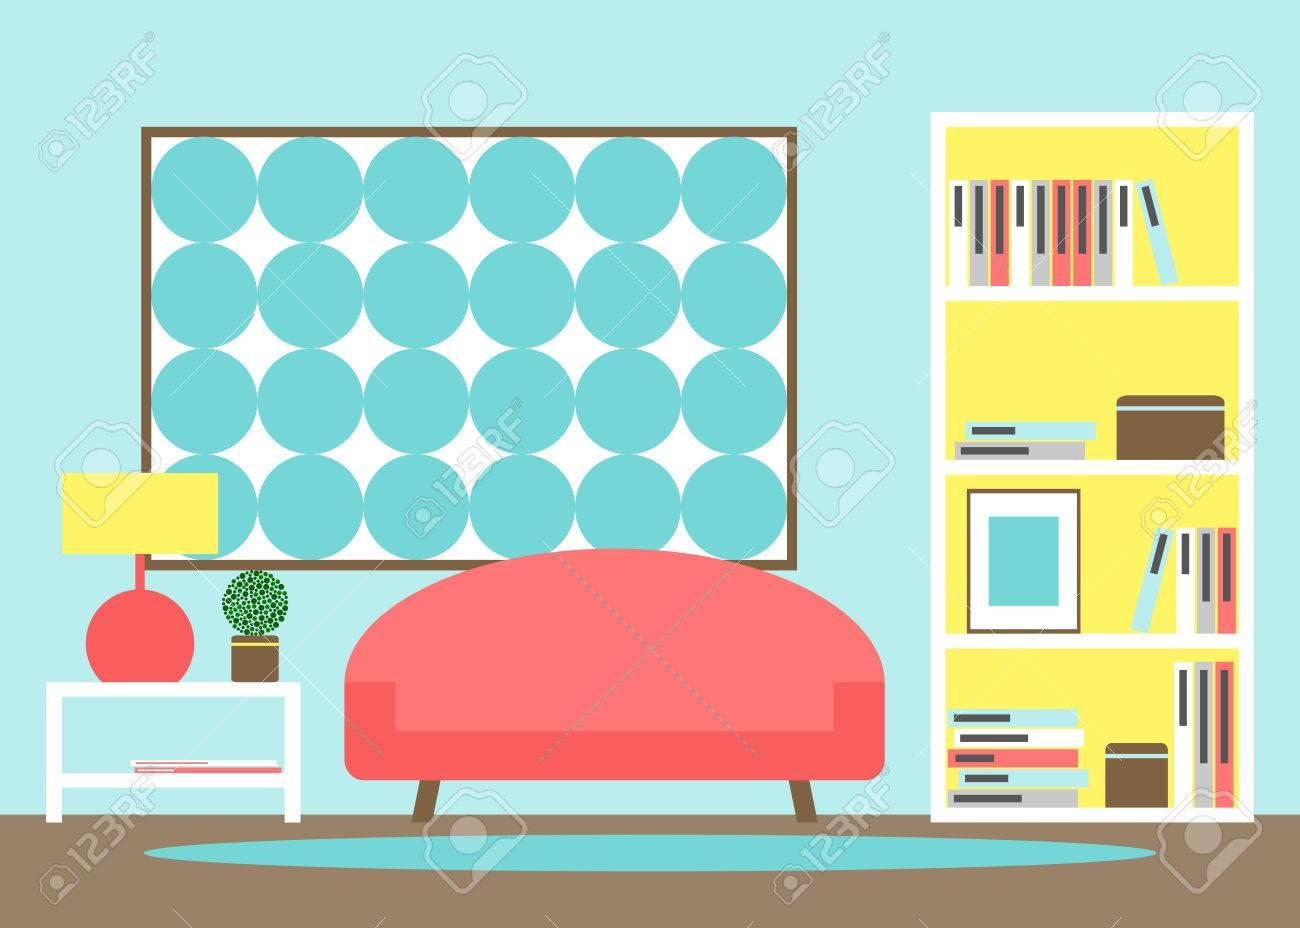 Sala. Moderna Sala De Estar Con Muebles De Interior. Sofá ...